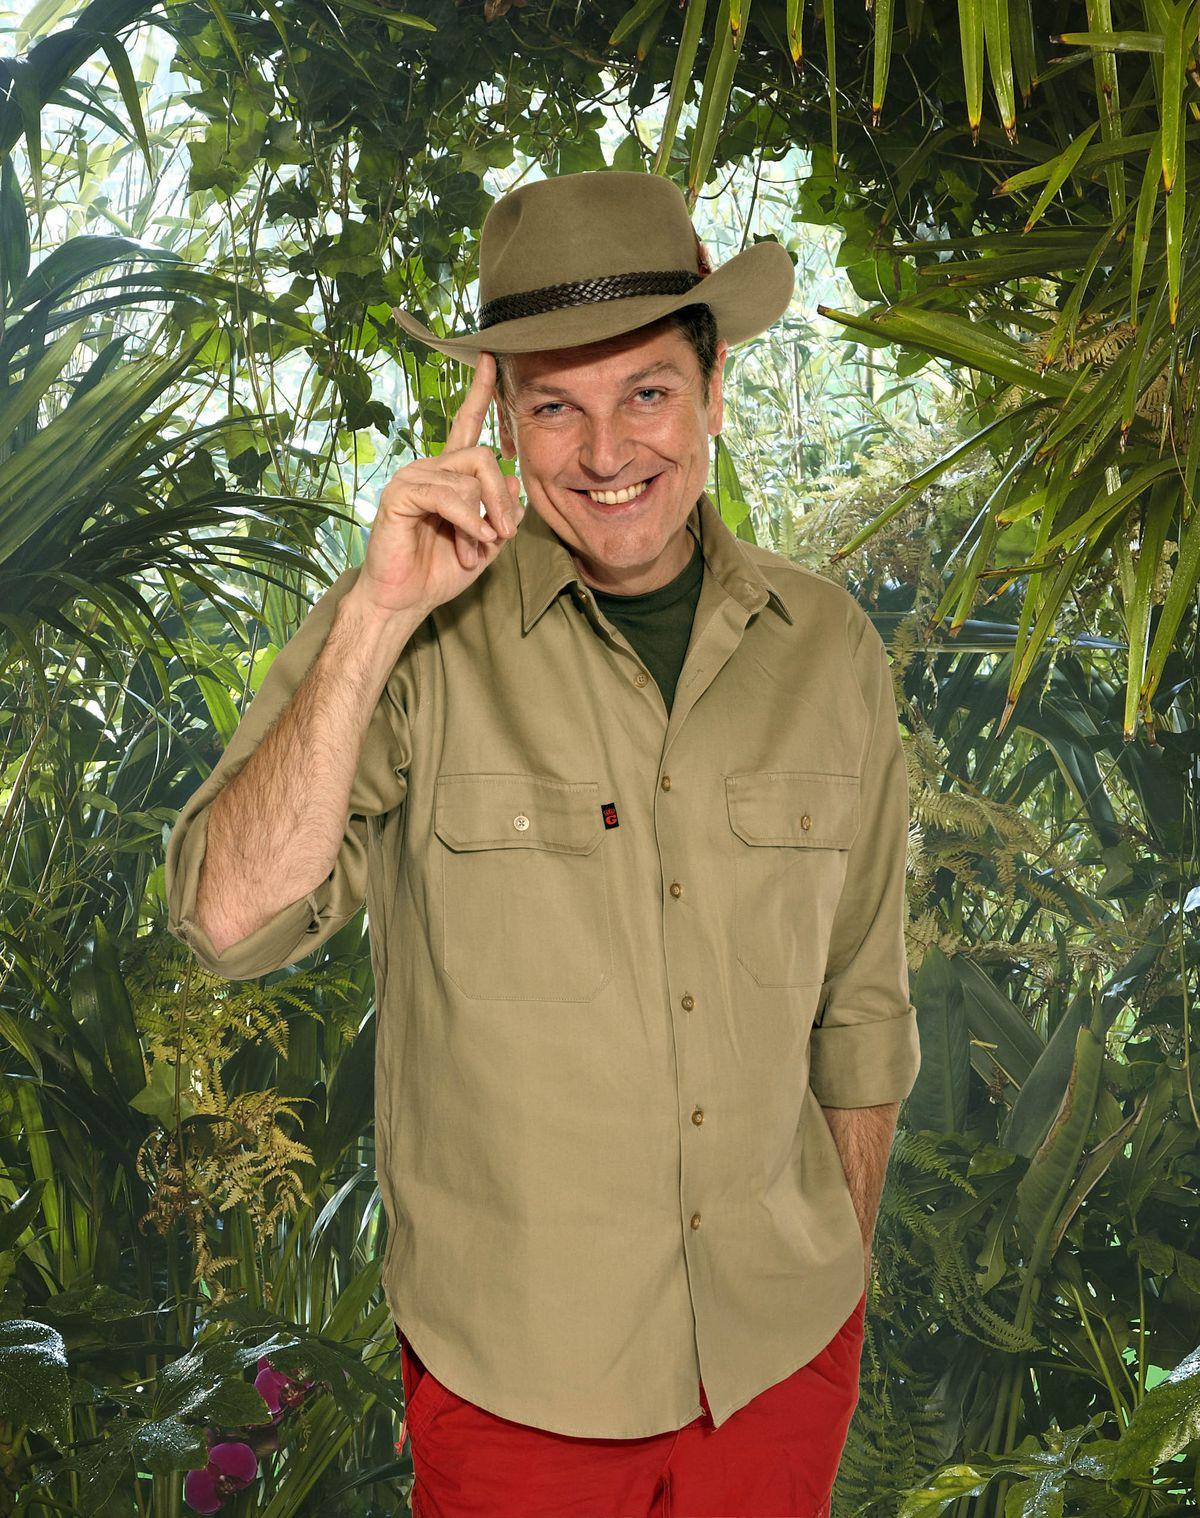 Jungle fever – Brian was in I'm A Celebrity in 2012